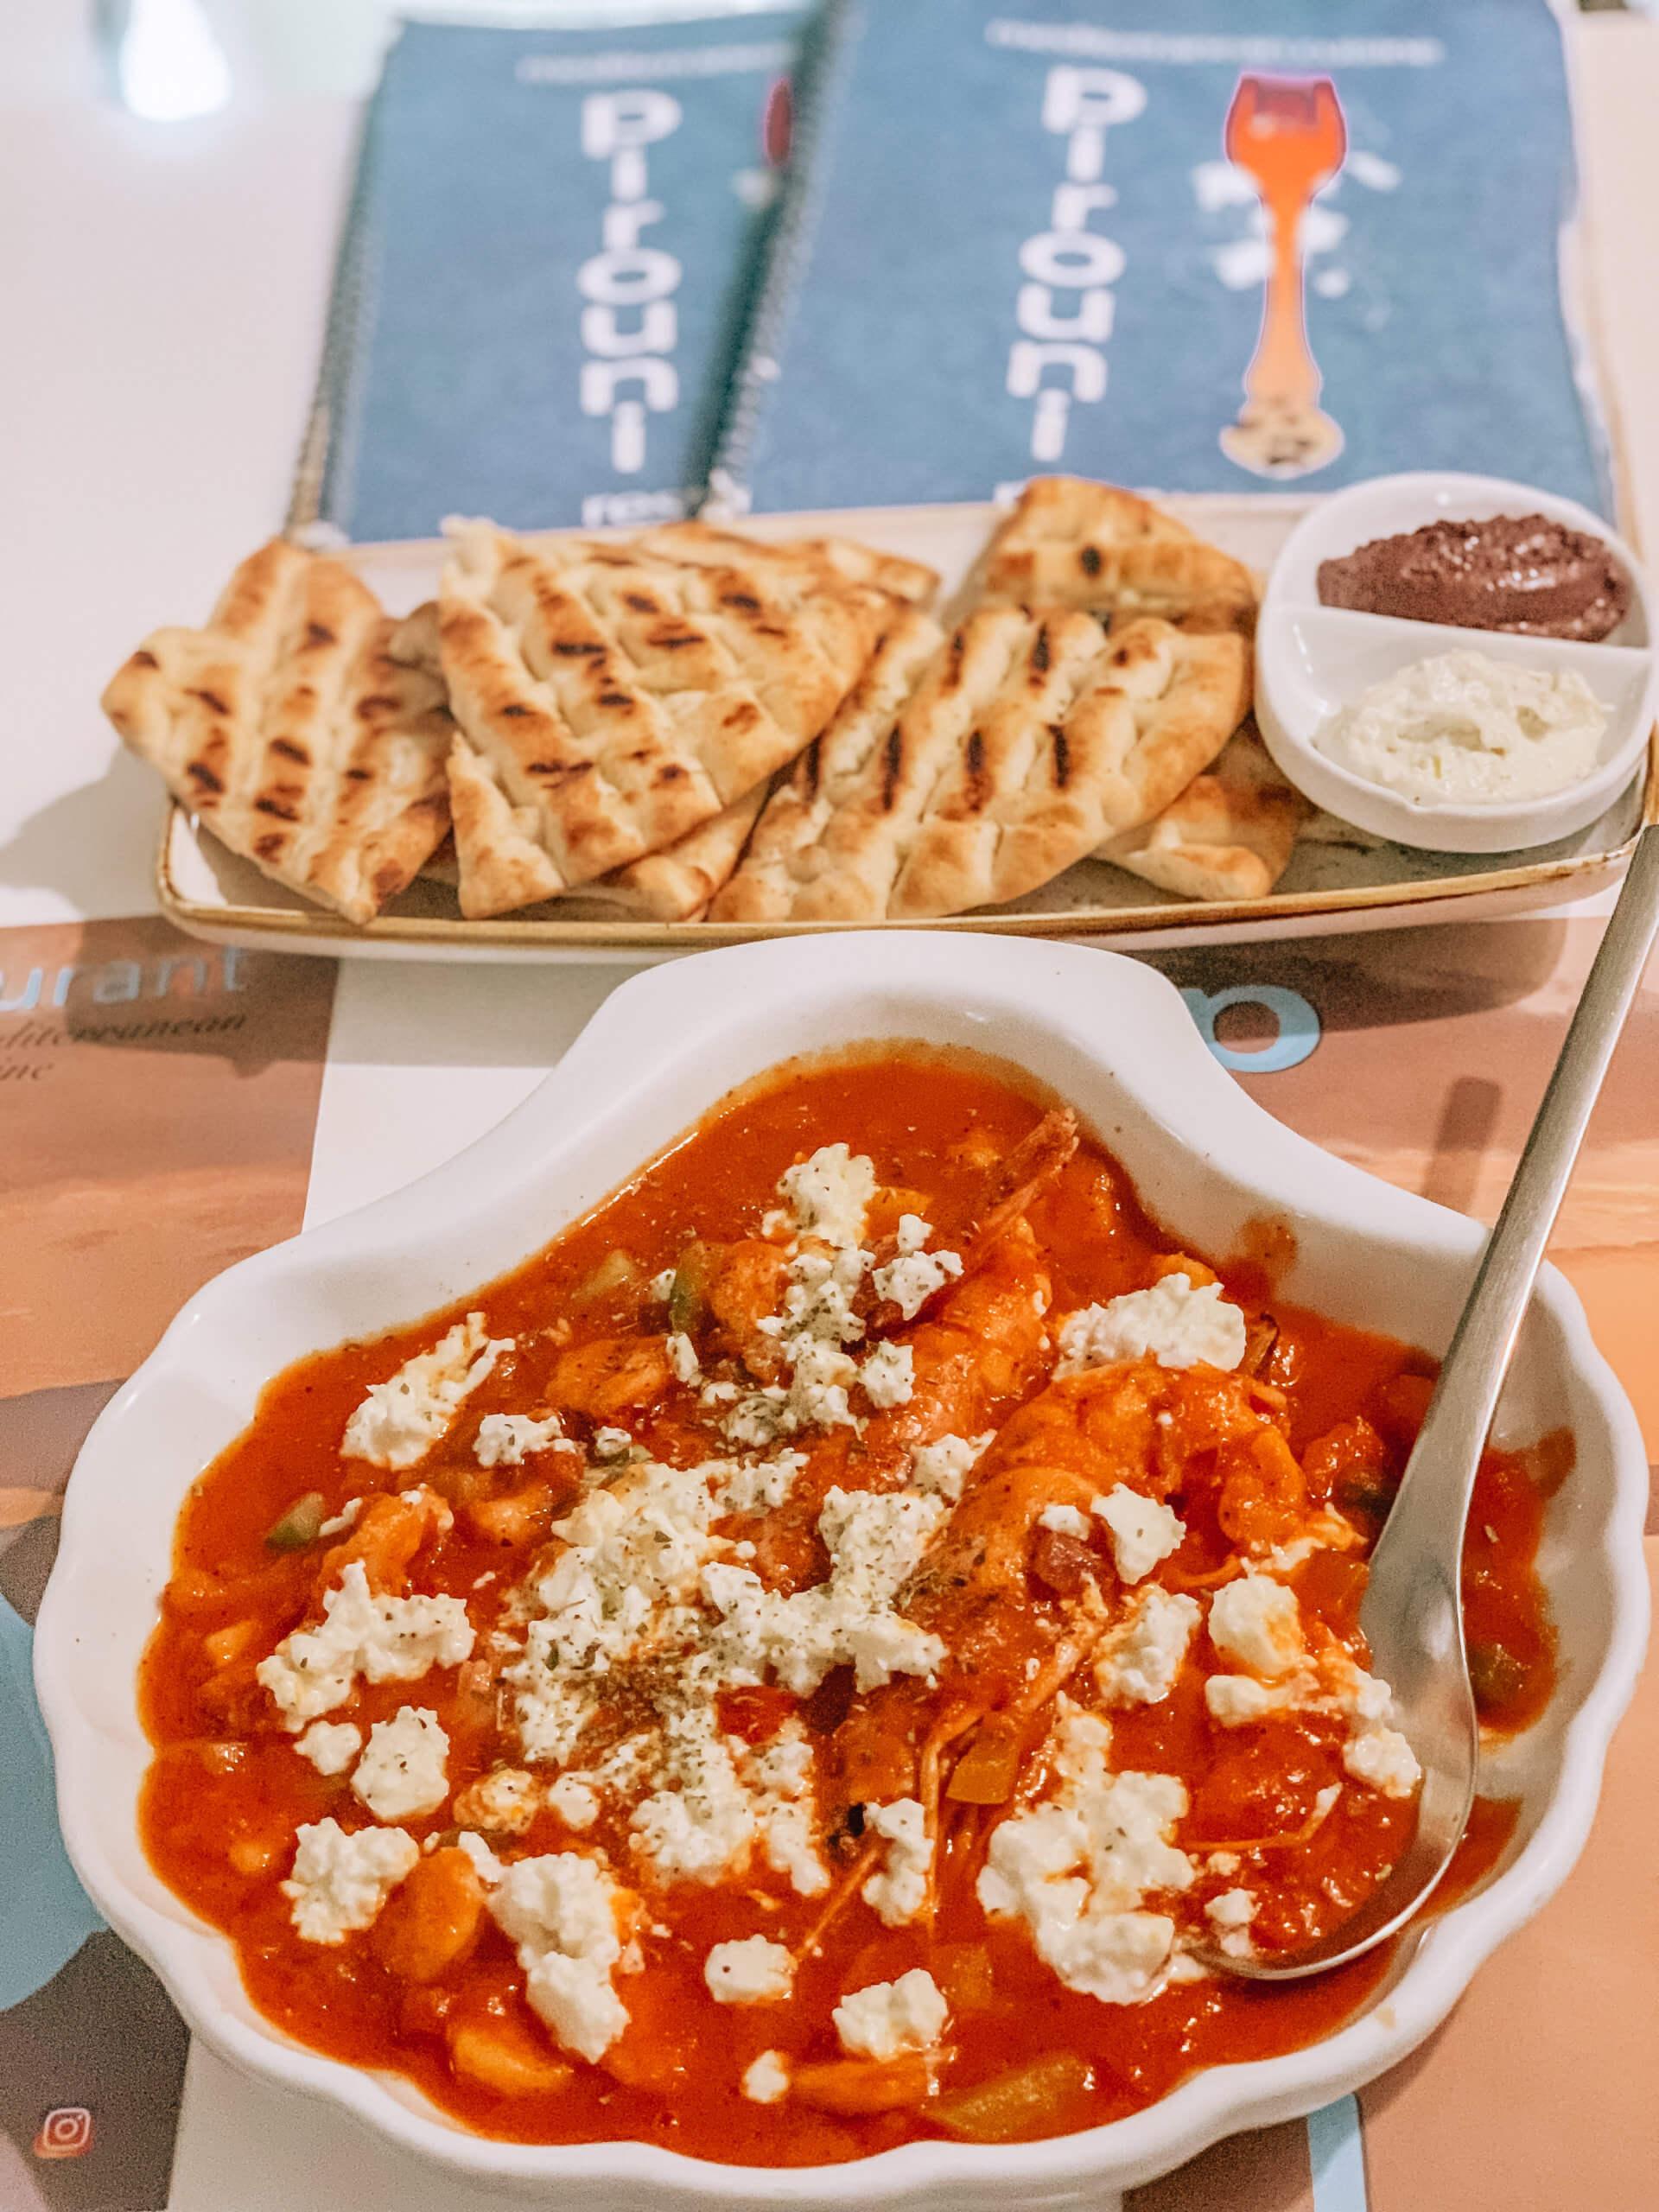 Santorini Top Best Restaurants | Pirouni Restaurant Appetizer